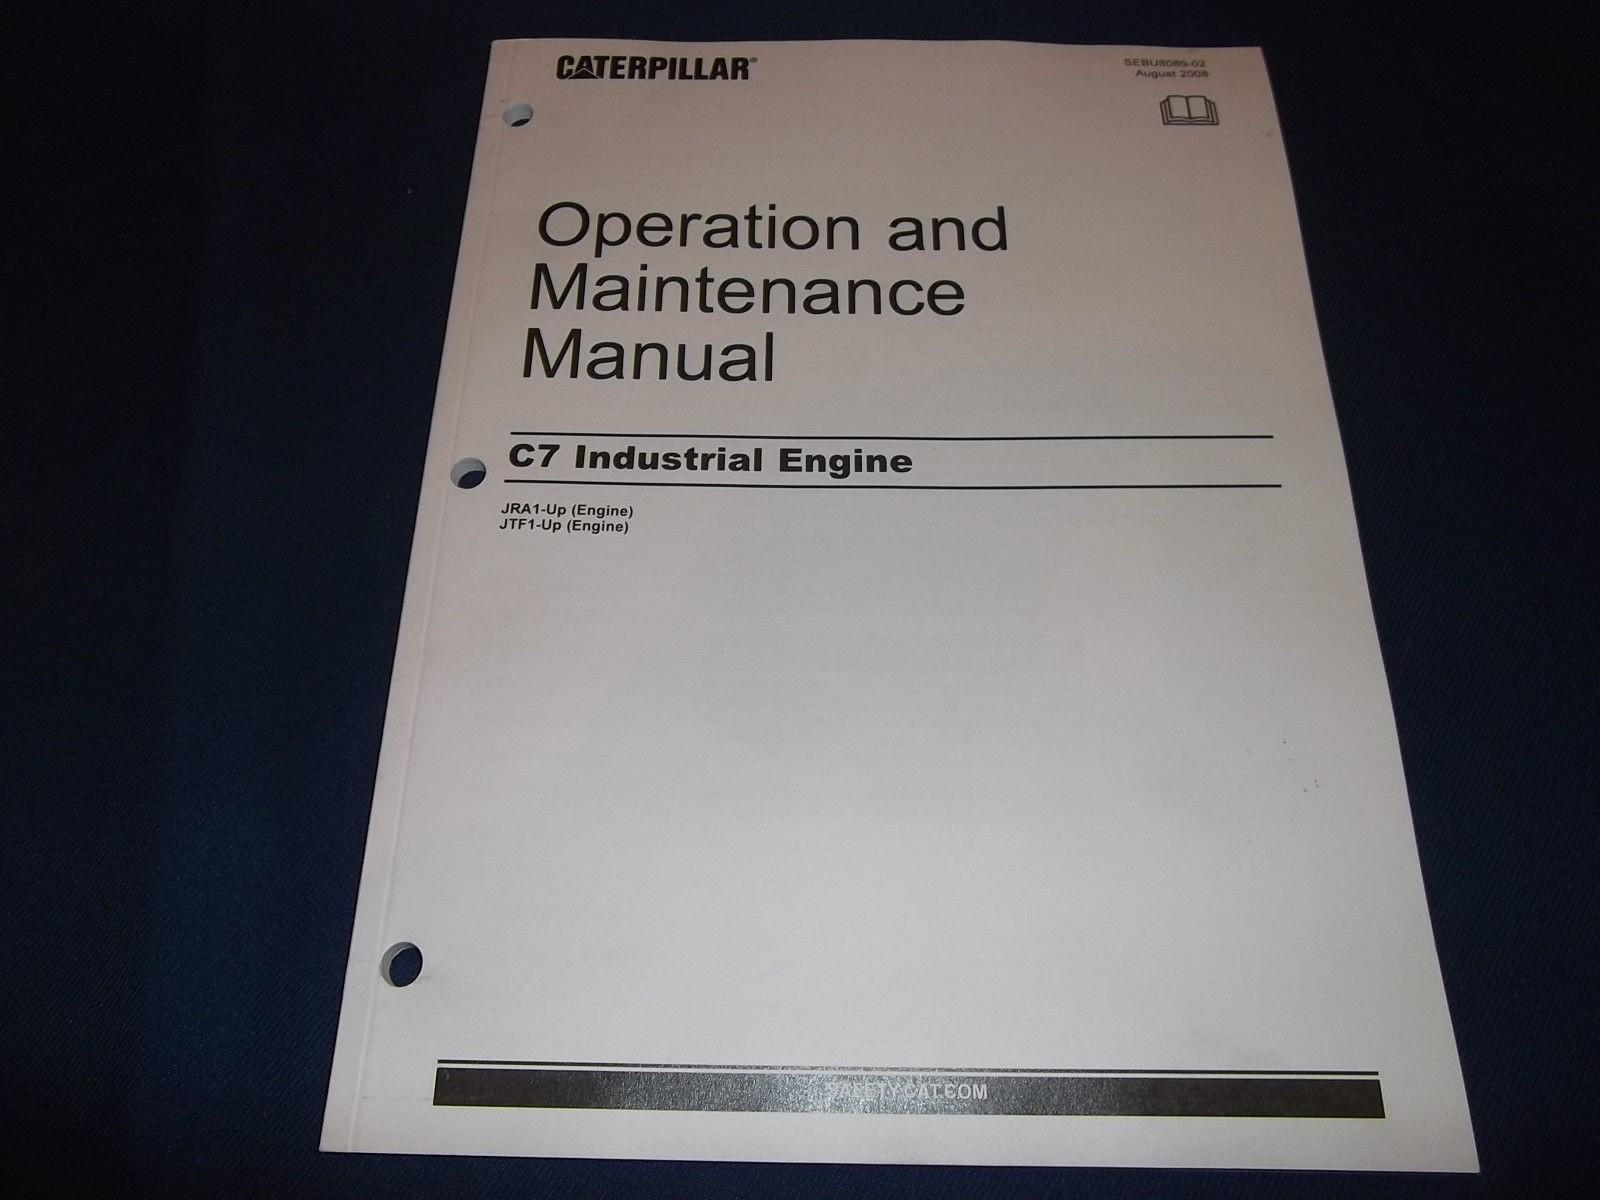 hight resolution of 3208 cat engine parts diagram cat caterpillar c7 industrial engine operation maintenance manual